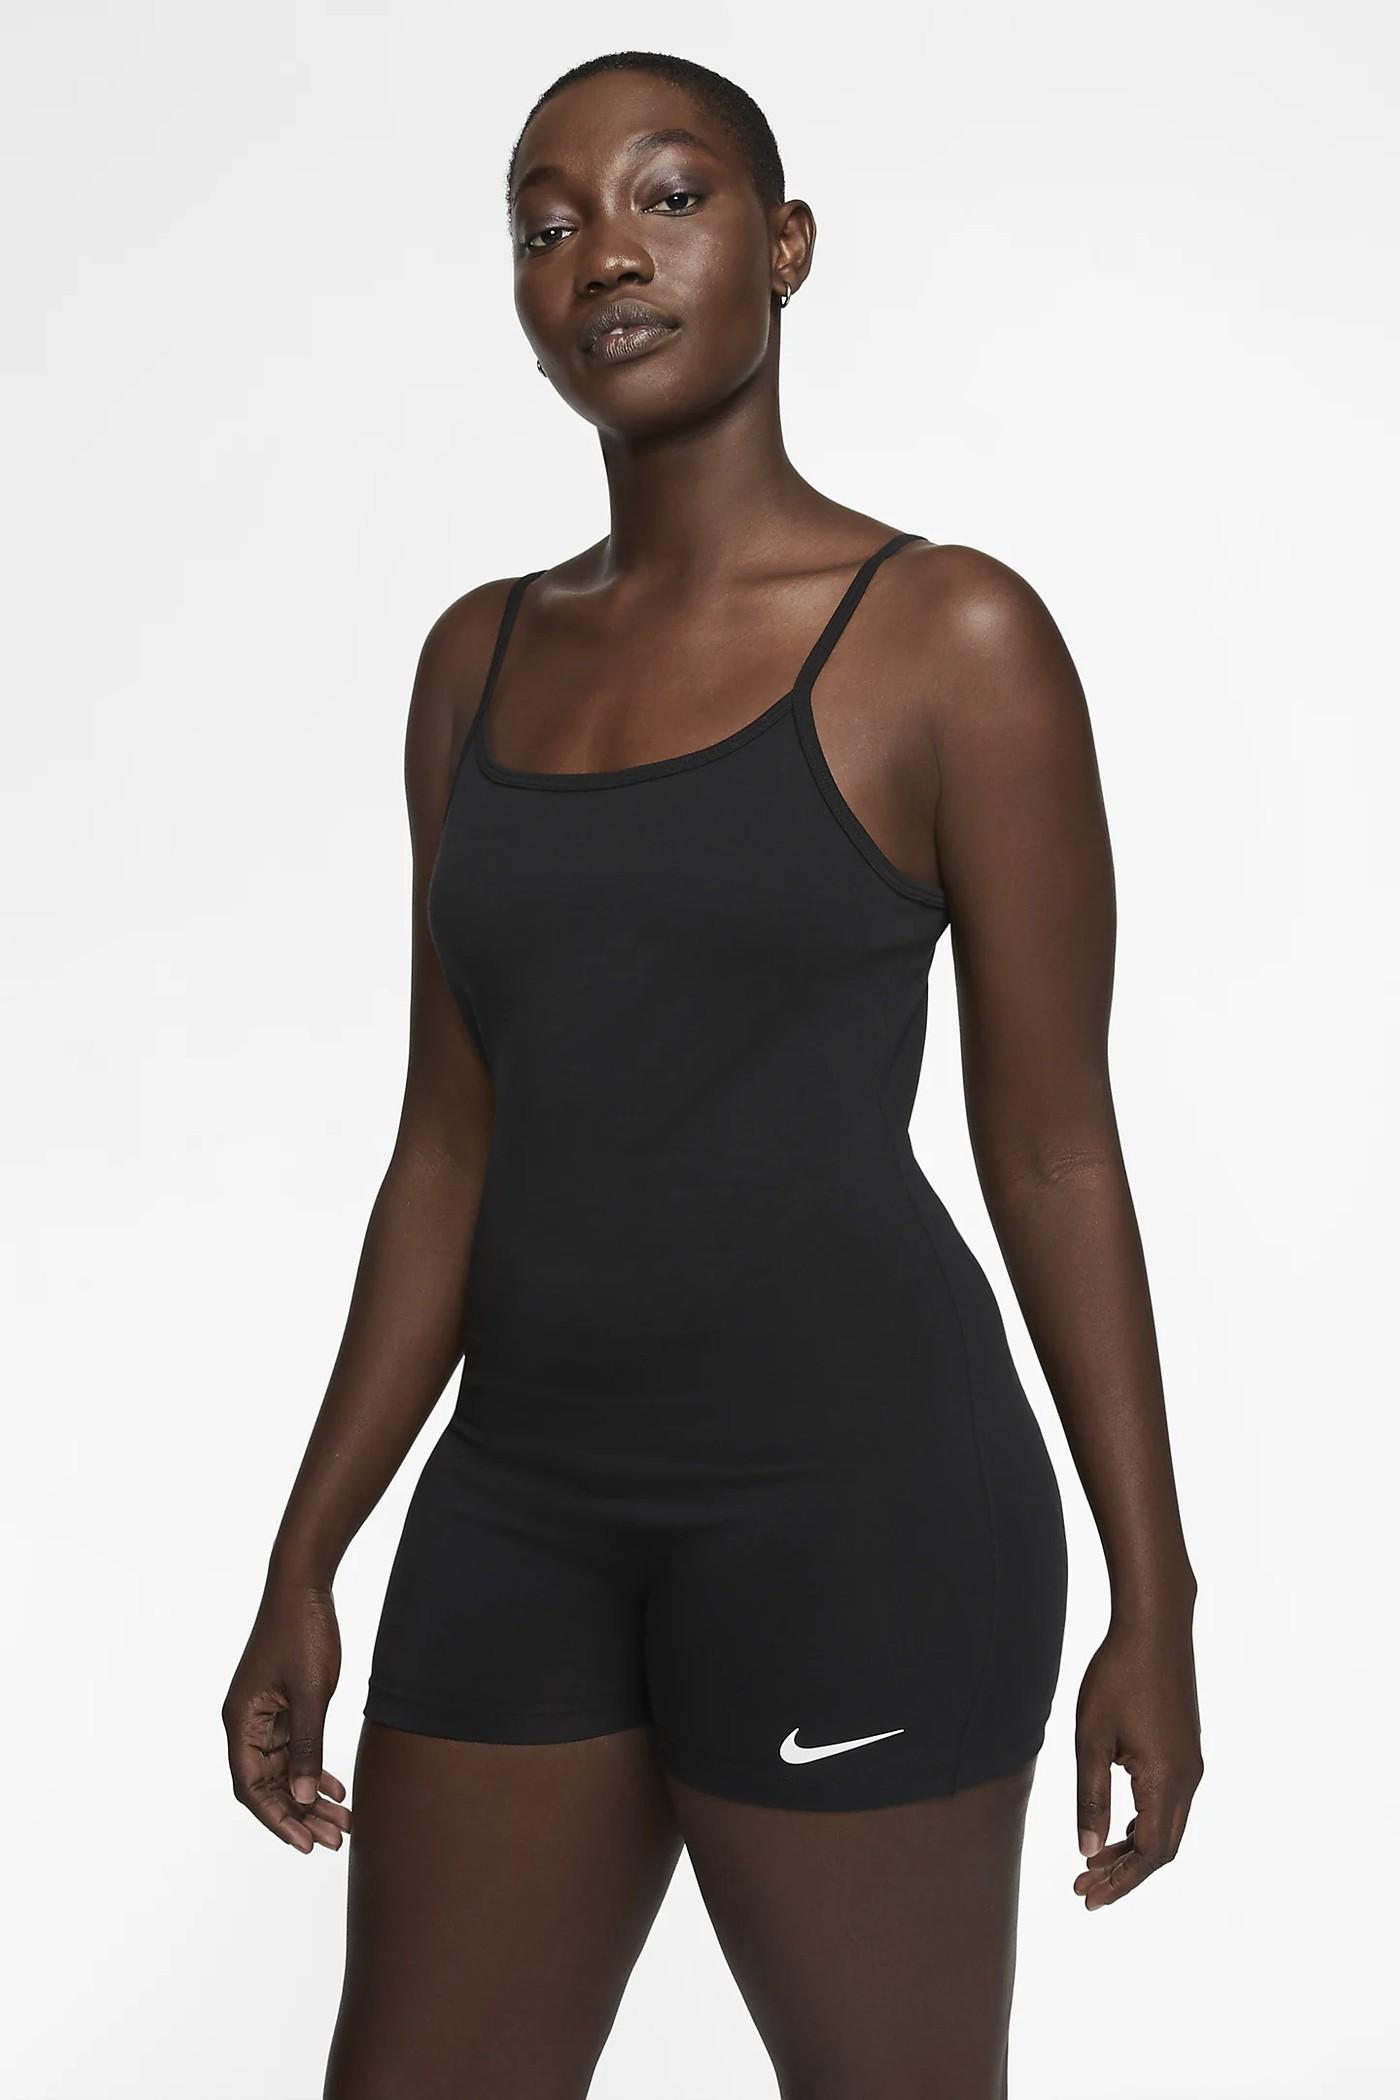 nike logo bodysuit black white minimal